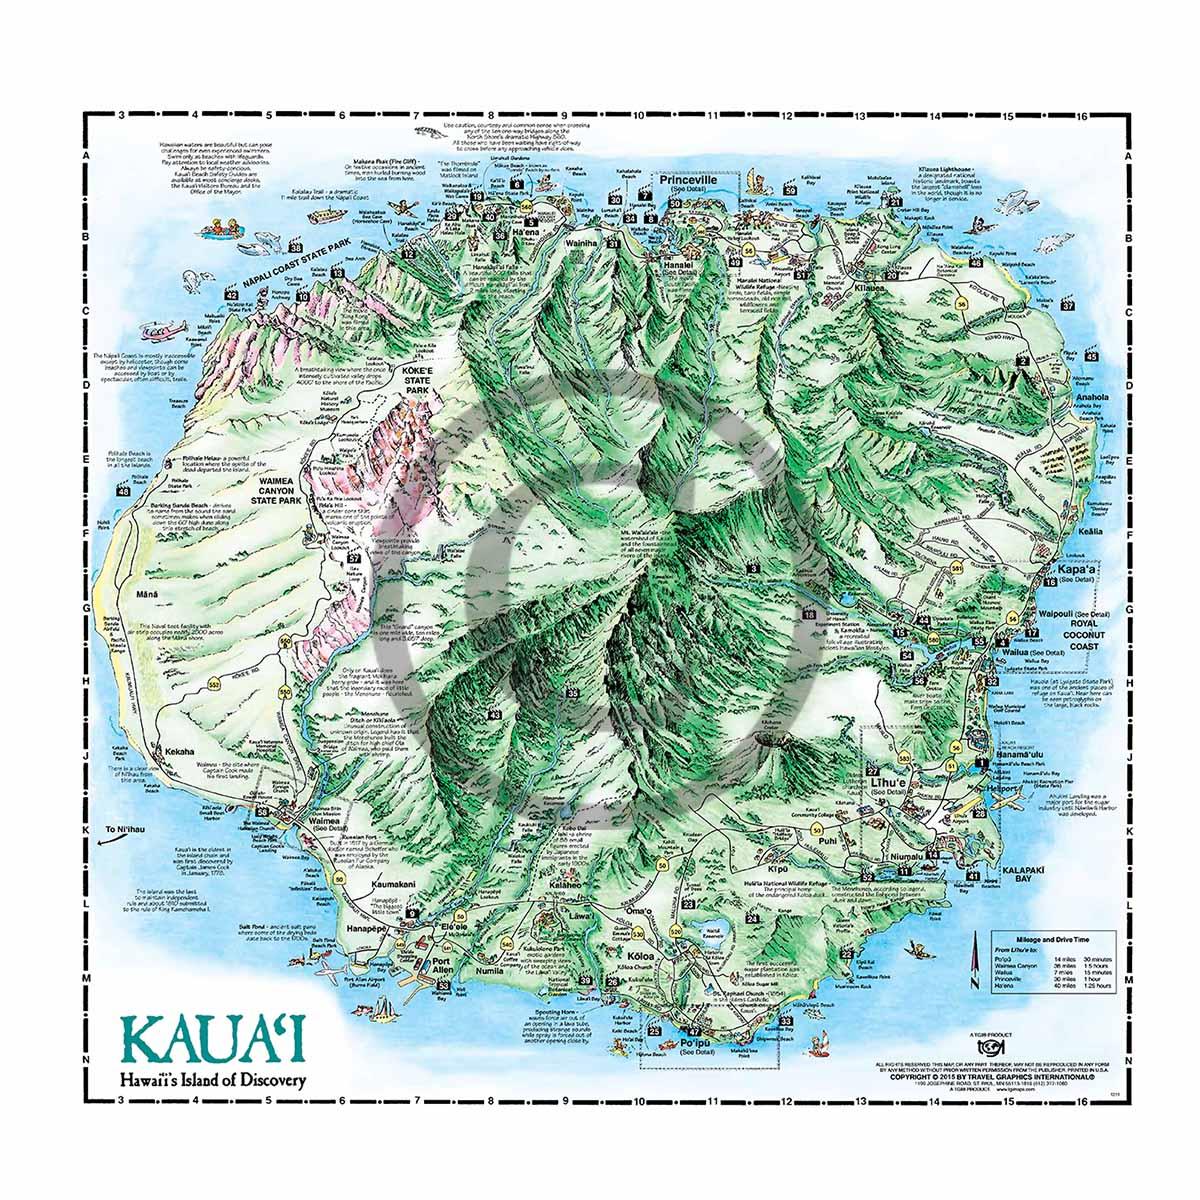 Kauai Pocket Map on kin map, kawasaki map, martin map, waldorf map, sacred ridge site map, iwate prefecture map, iwaizumi map, baldwin map, marshall map,